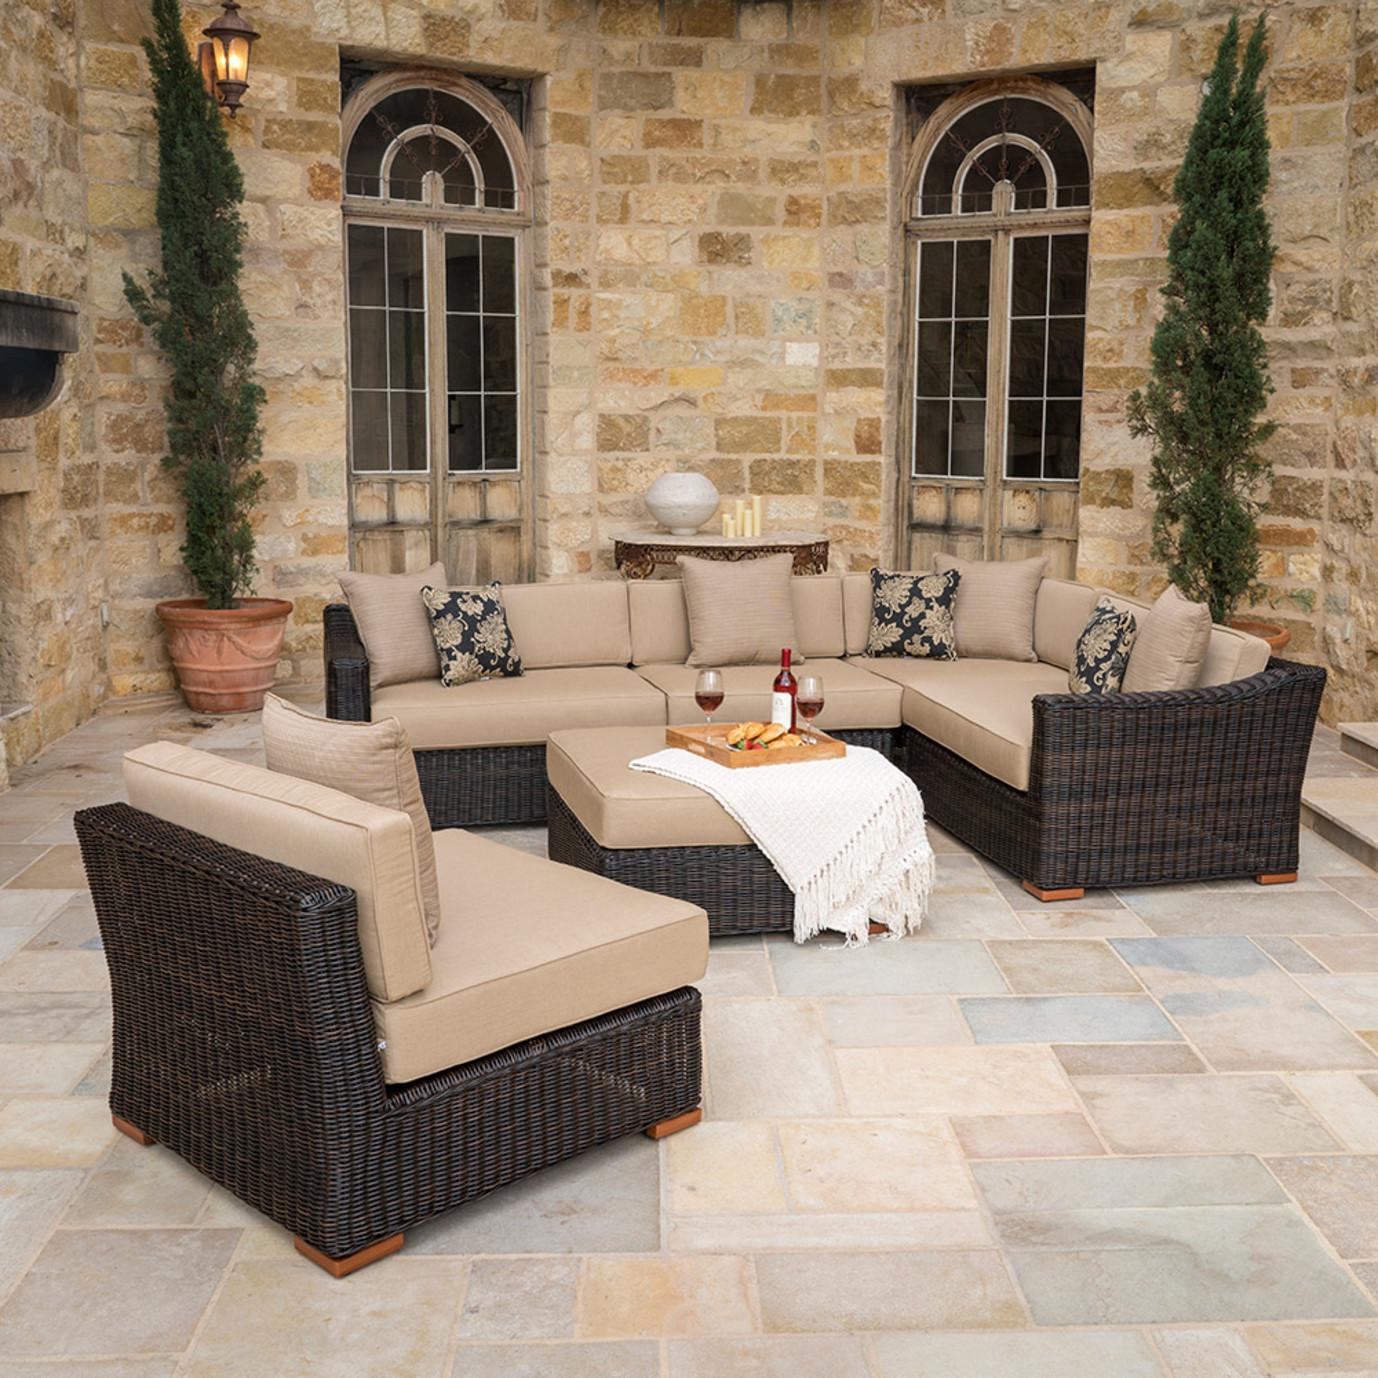 Resort™ 6 Piece Sectional Set with Ottoman - Espresso/Heather Beige